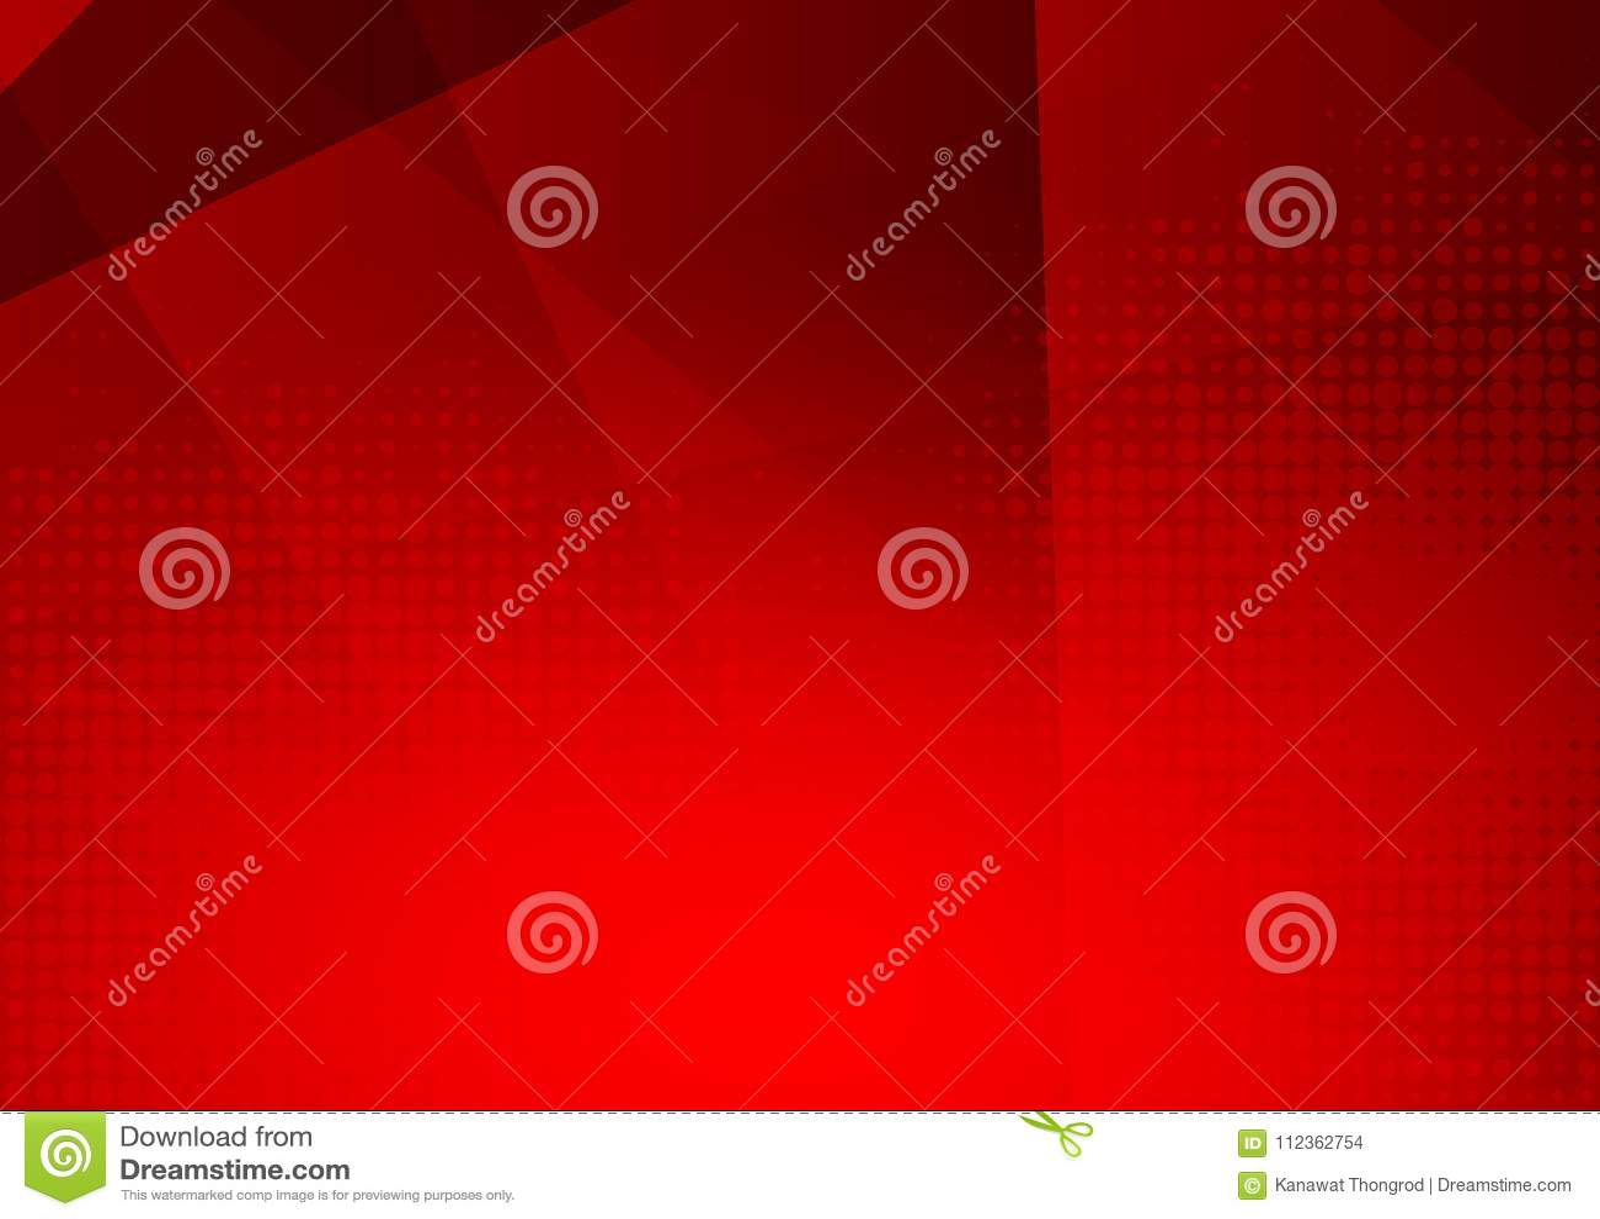 Röd modern futuristisk geometrisk abstrakt vektorbakgrund med kopieringsutrymme, modern design